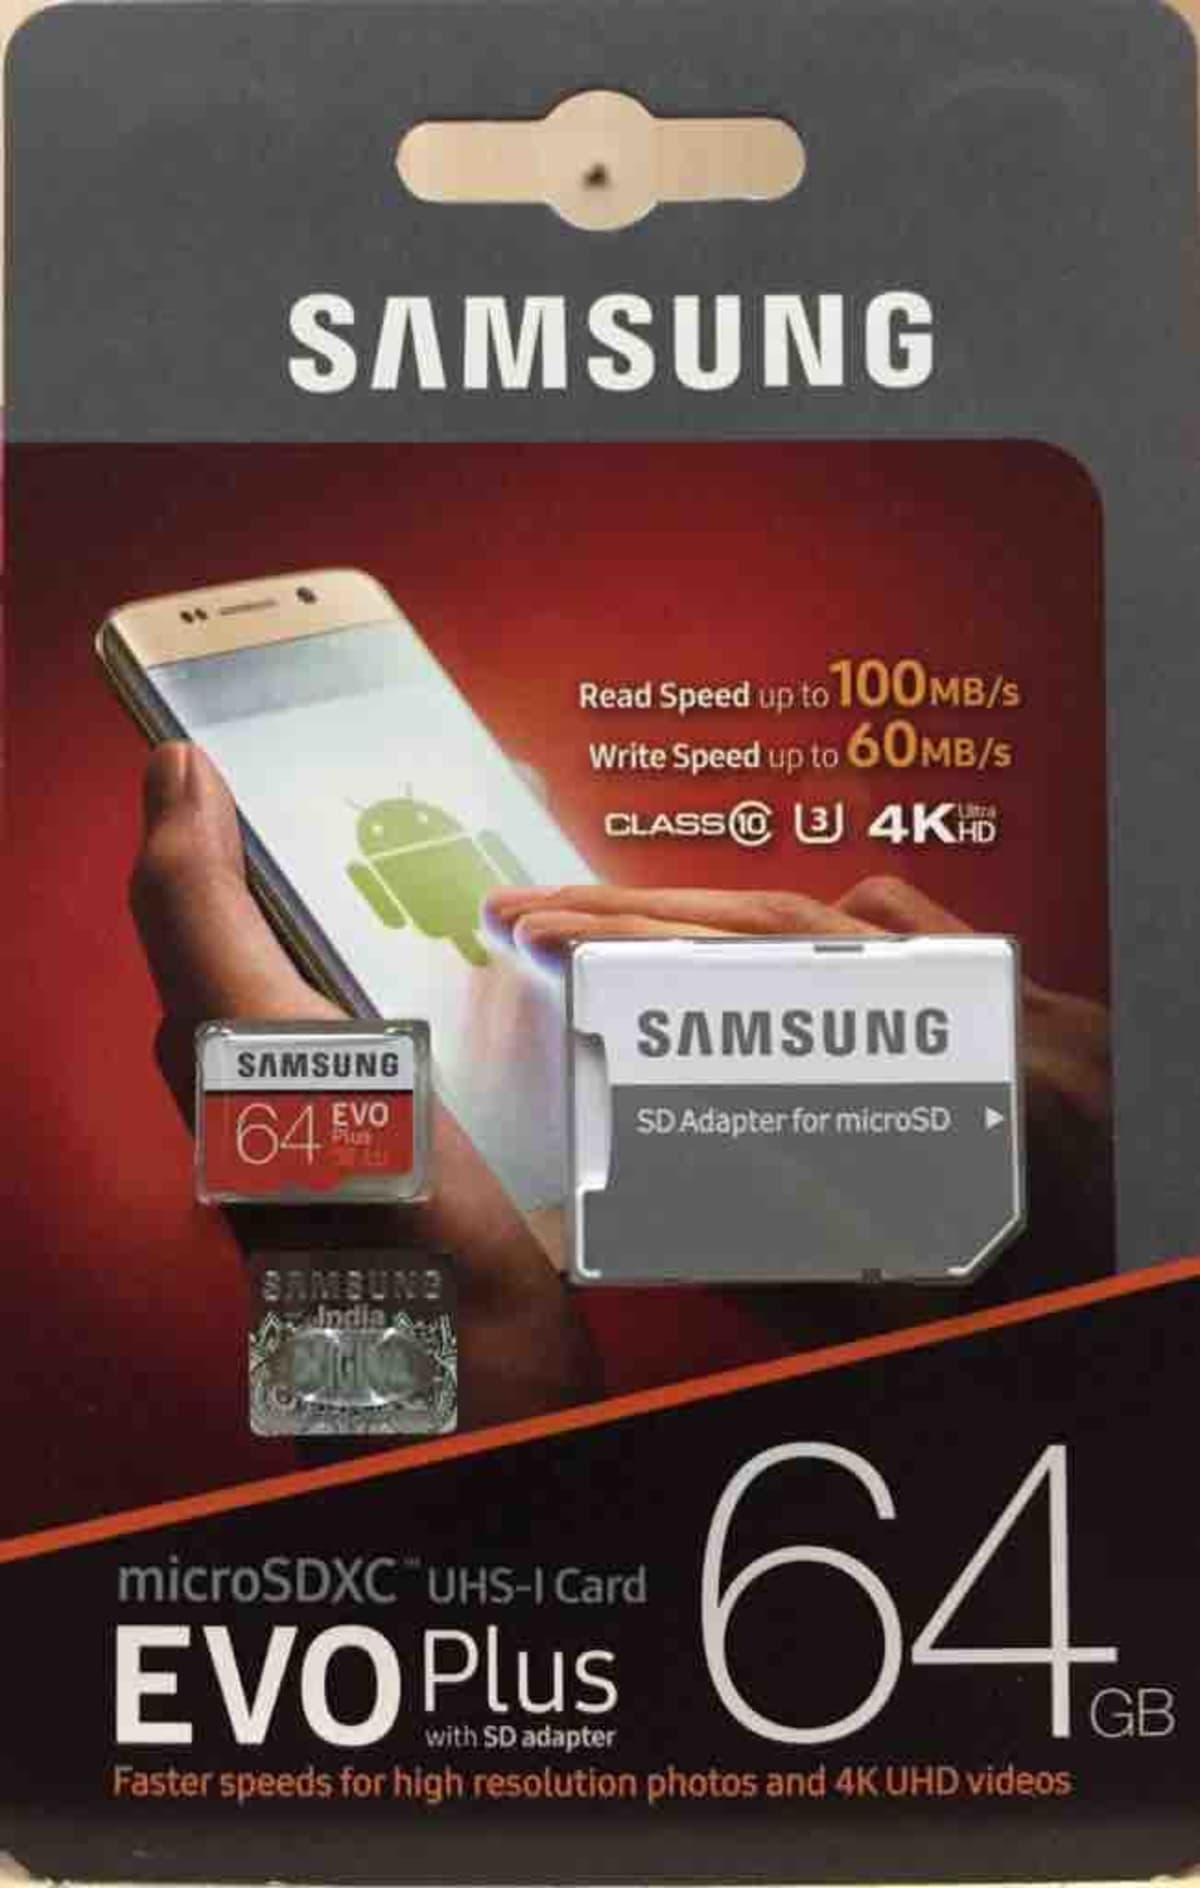 SAMSUNG 64 GB EVO PLUS Class 10 Memory Card  100mbps/60mbps